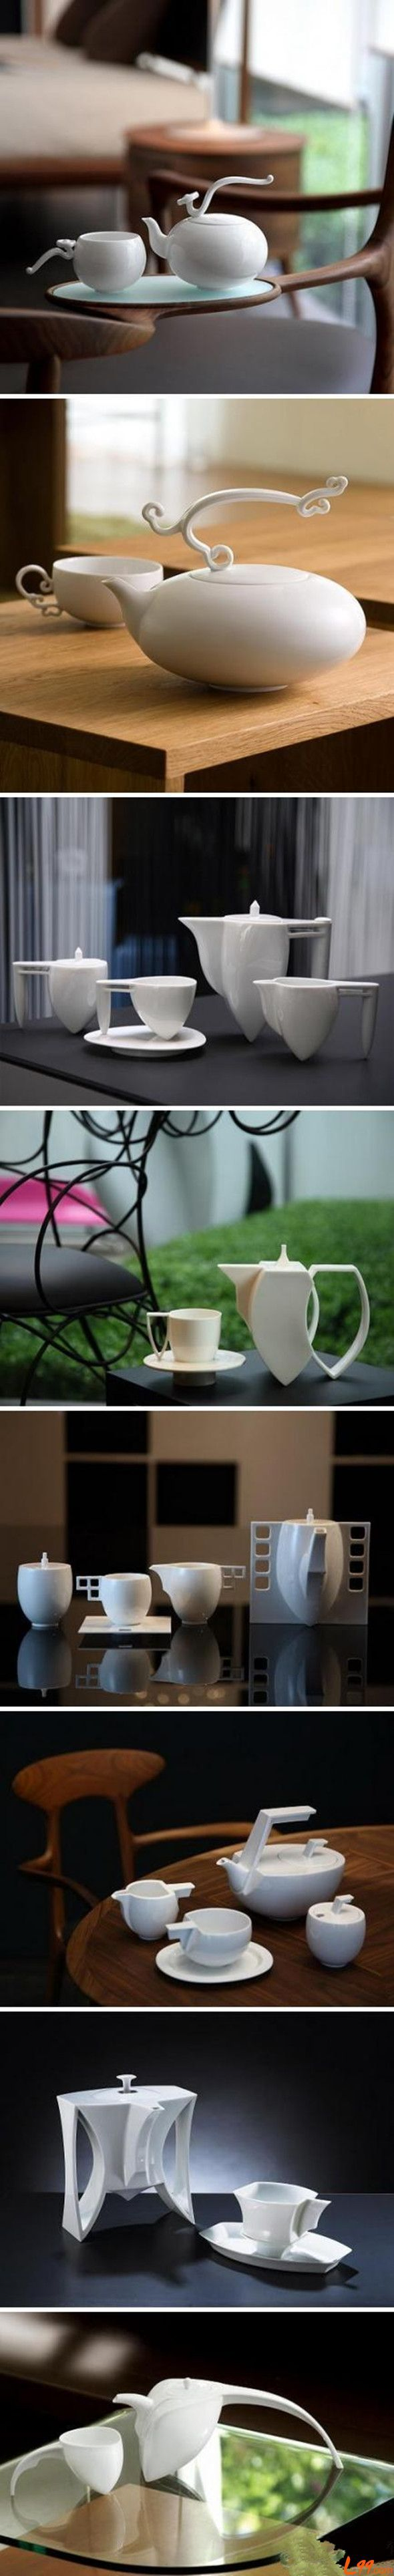 Chinese tea et design, by Heinrich Wang